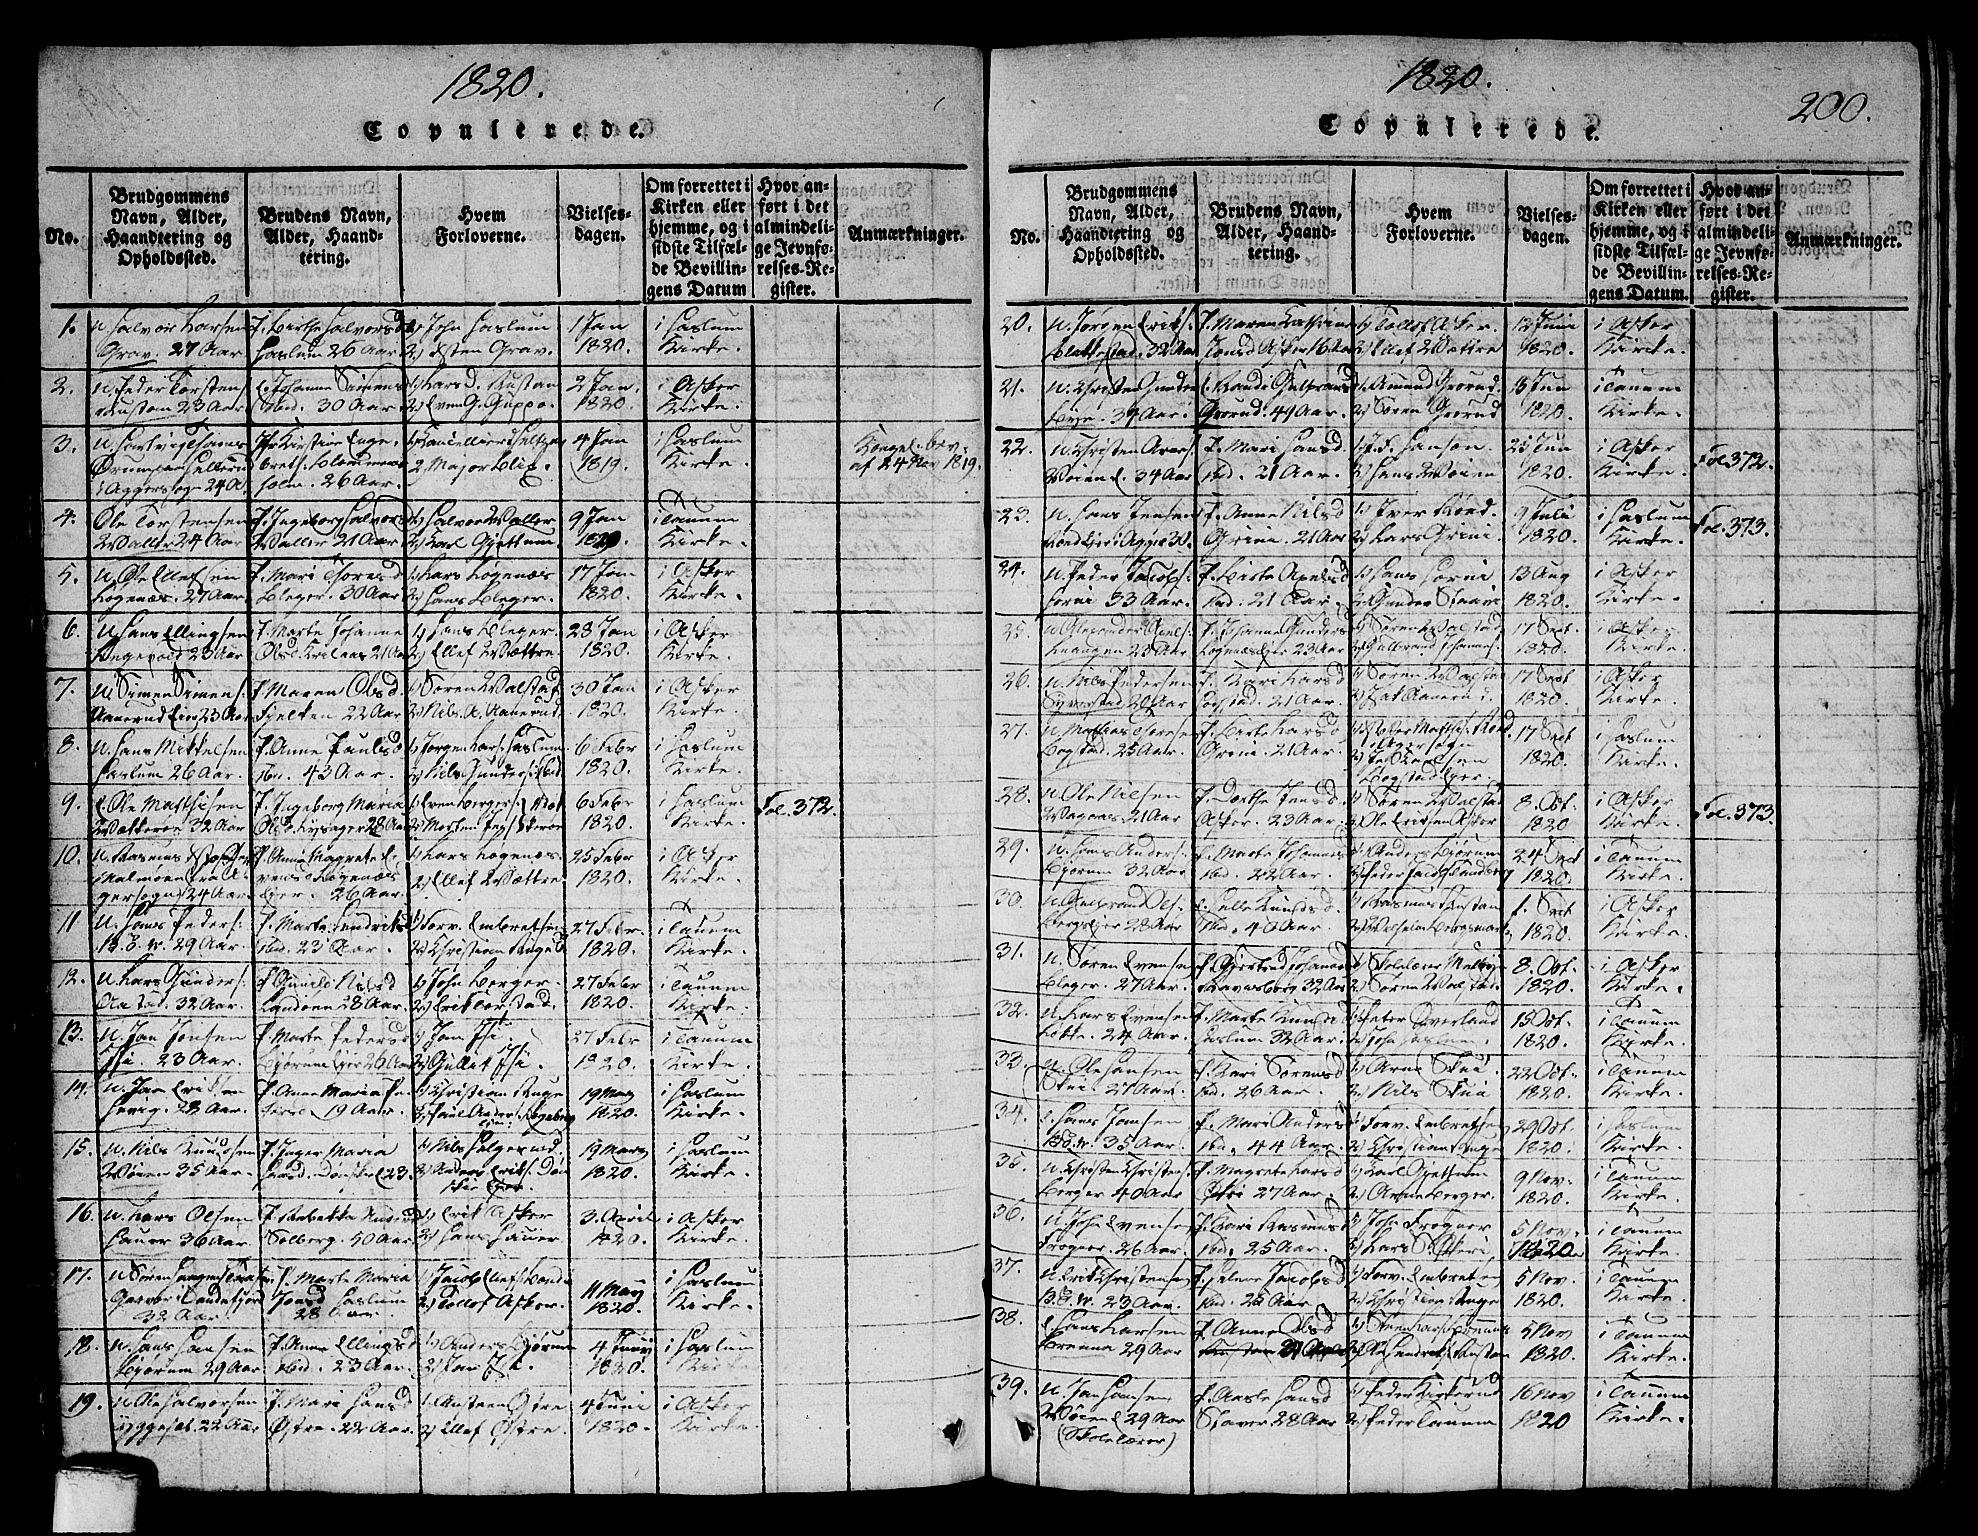 SAO, Asker prestekontor Kirkebøker, G/Ga/L0001: Klokkerbok nr. I 1, 1814-1830, s. 200